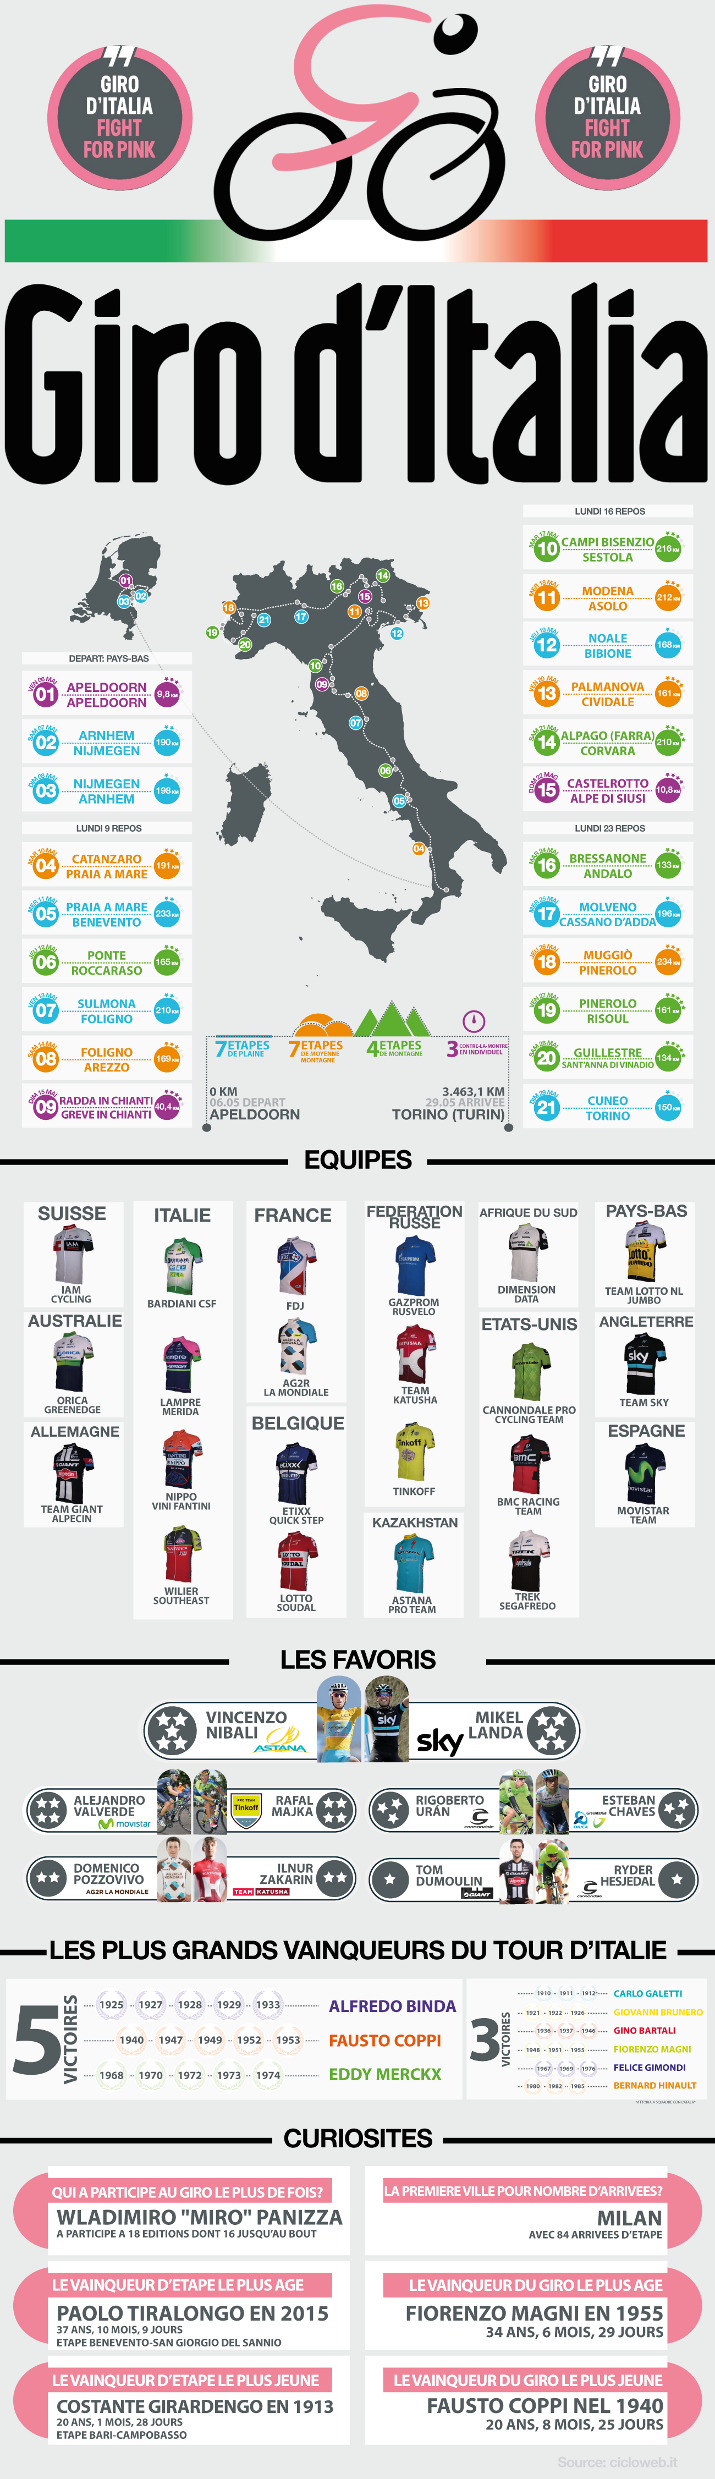 Giro Italia2016